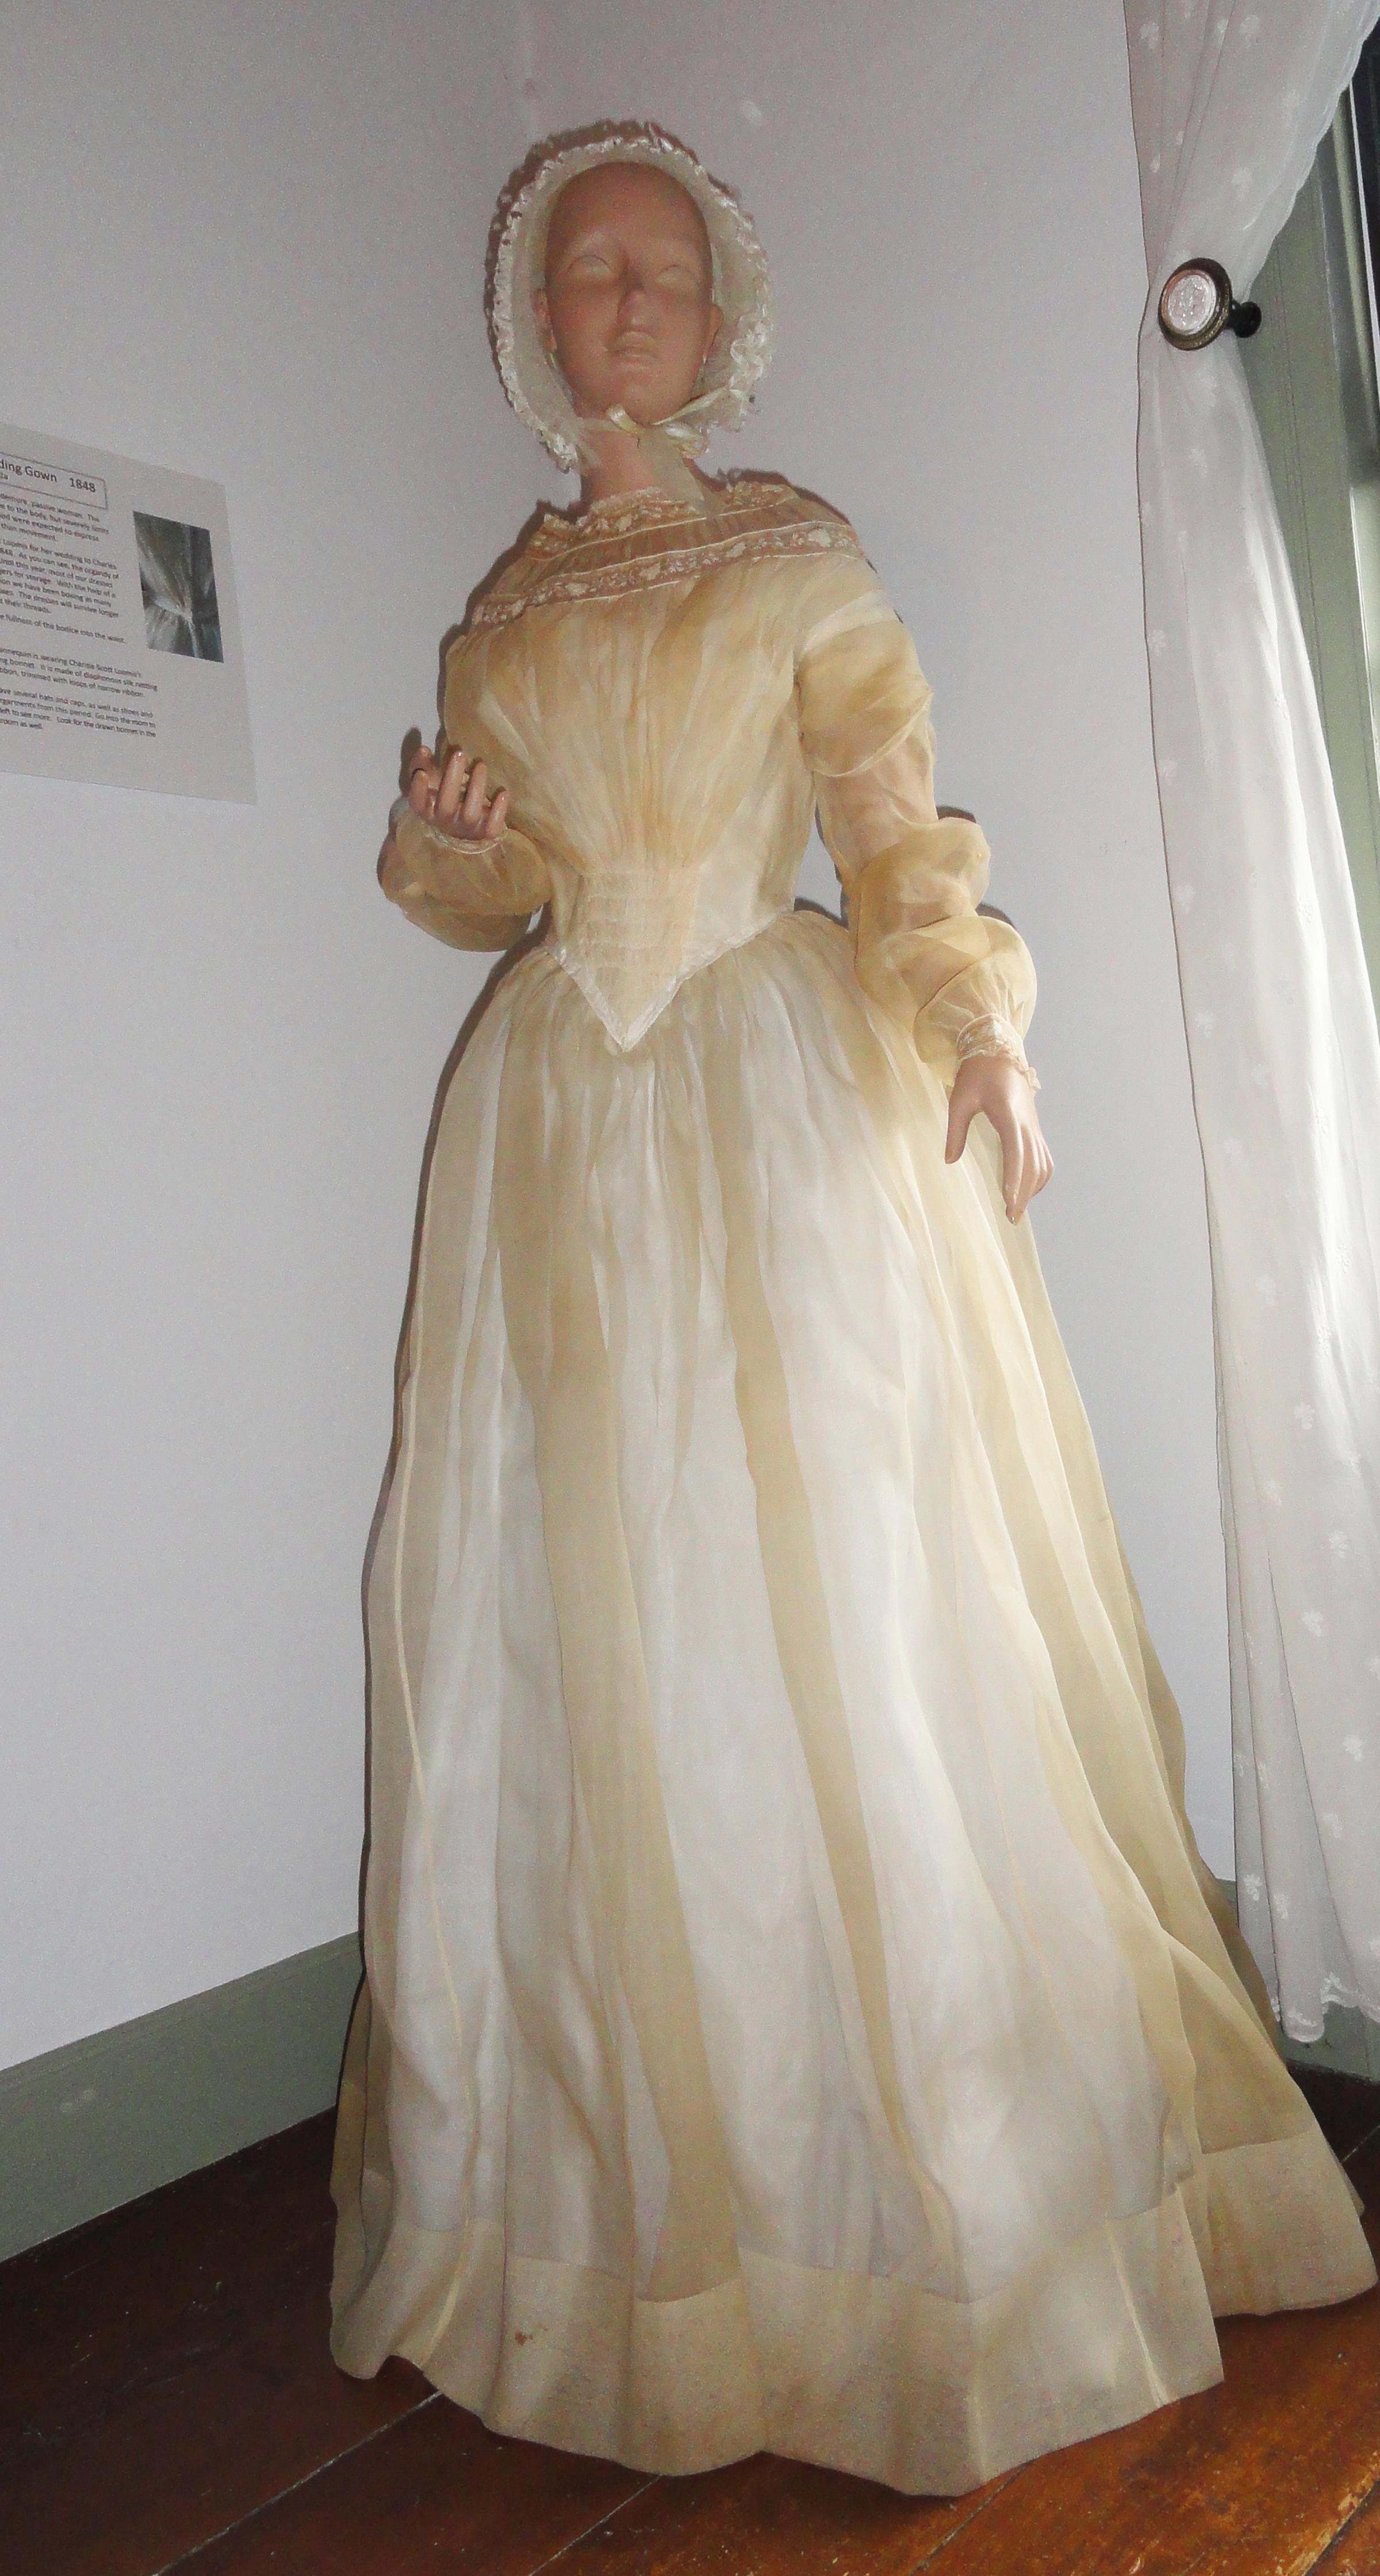 Bittinger: Historic Wedding Dresses | Vermont Public Radio